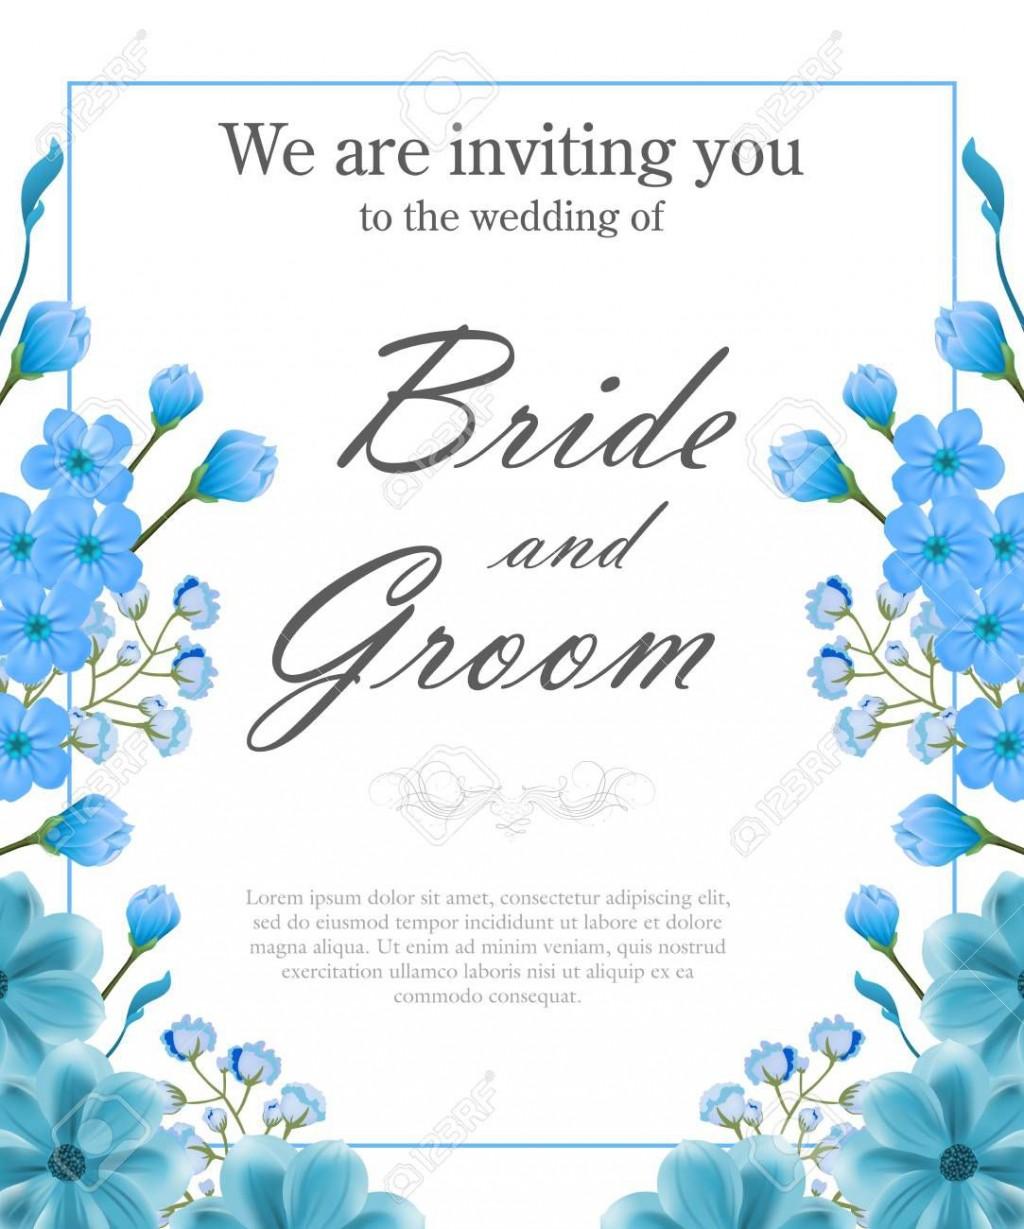 005 Imposing Sample Wedding Invitation Template Image  Templates Wording CardLarge